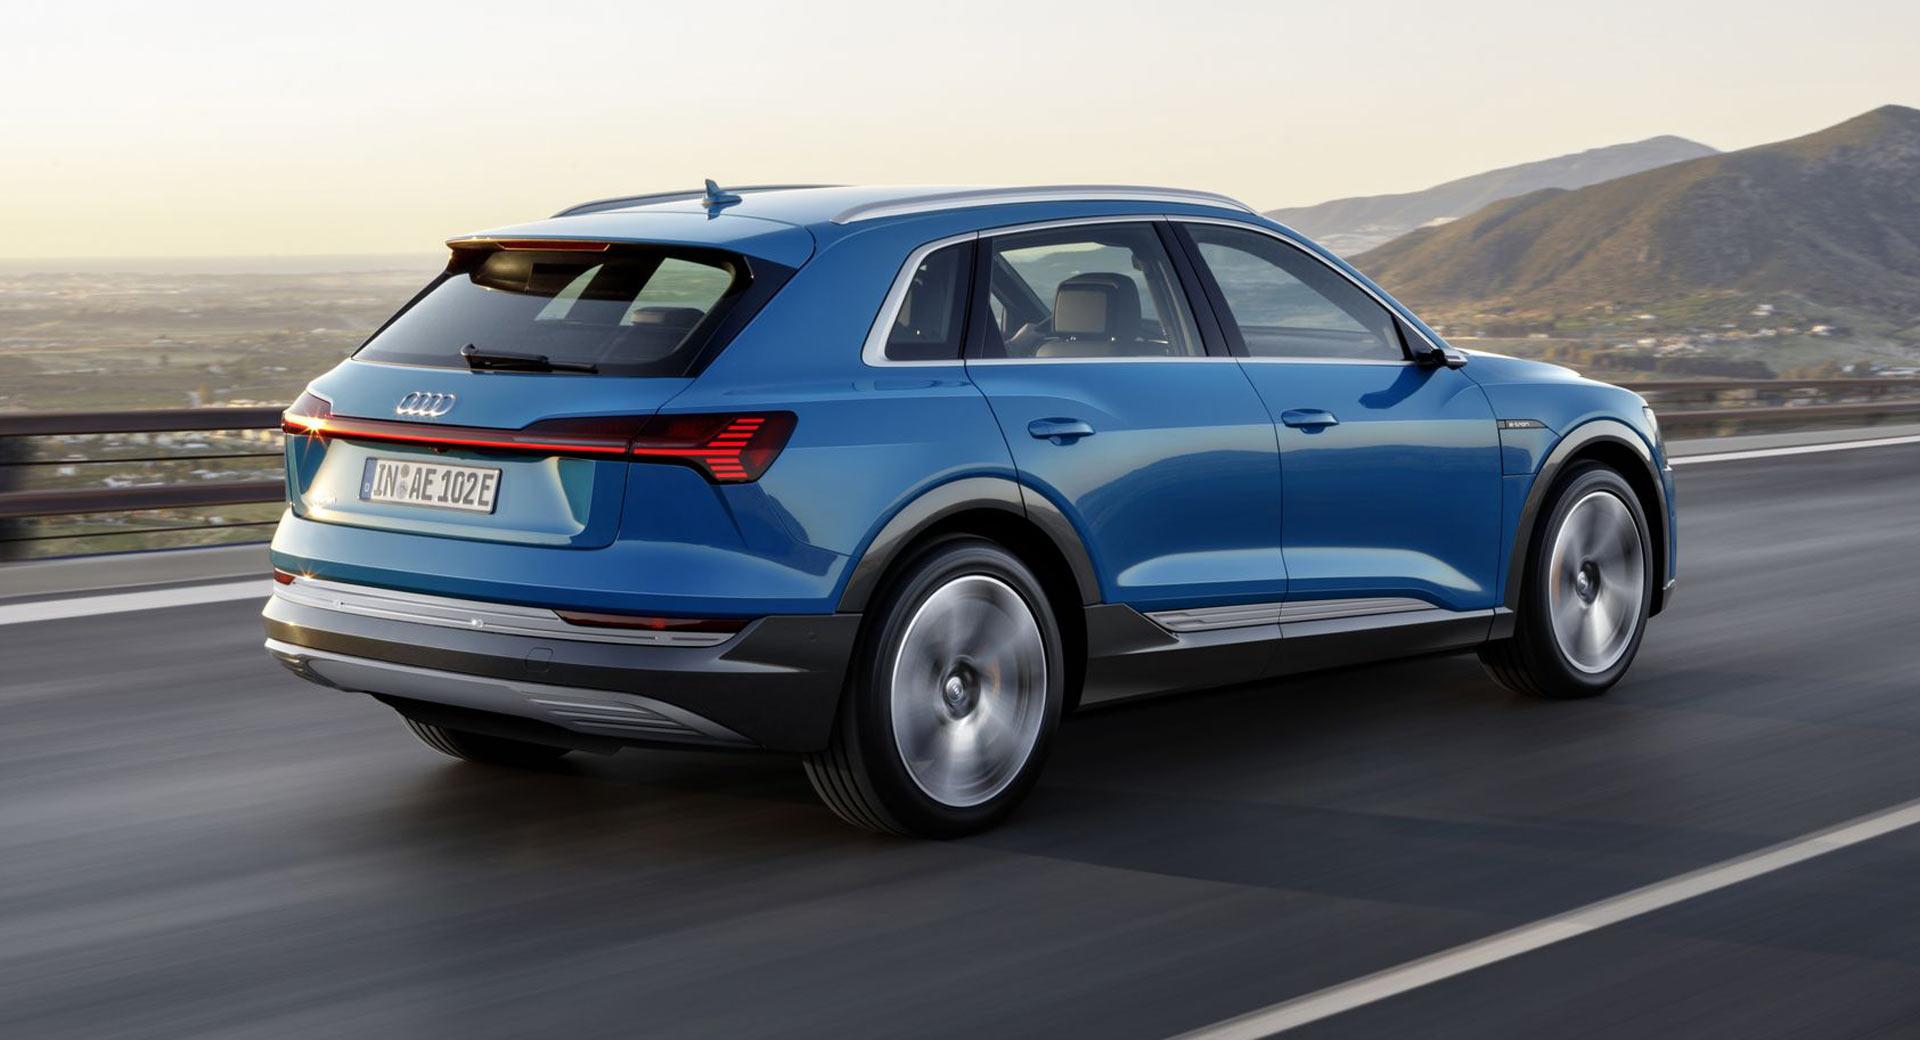 Audi Won't Stock Any E-Tron SUVs In Its U.S. Dealerships | Carscoops